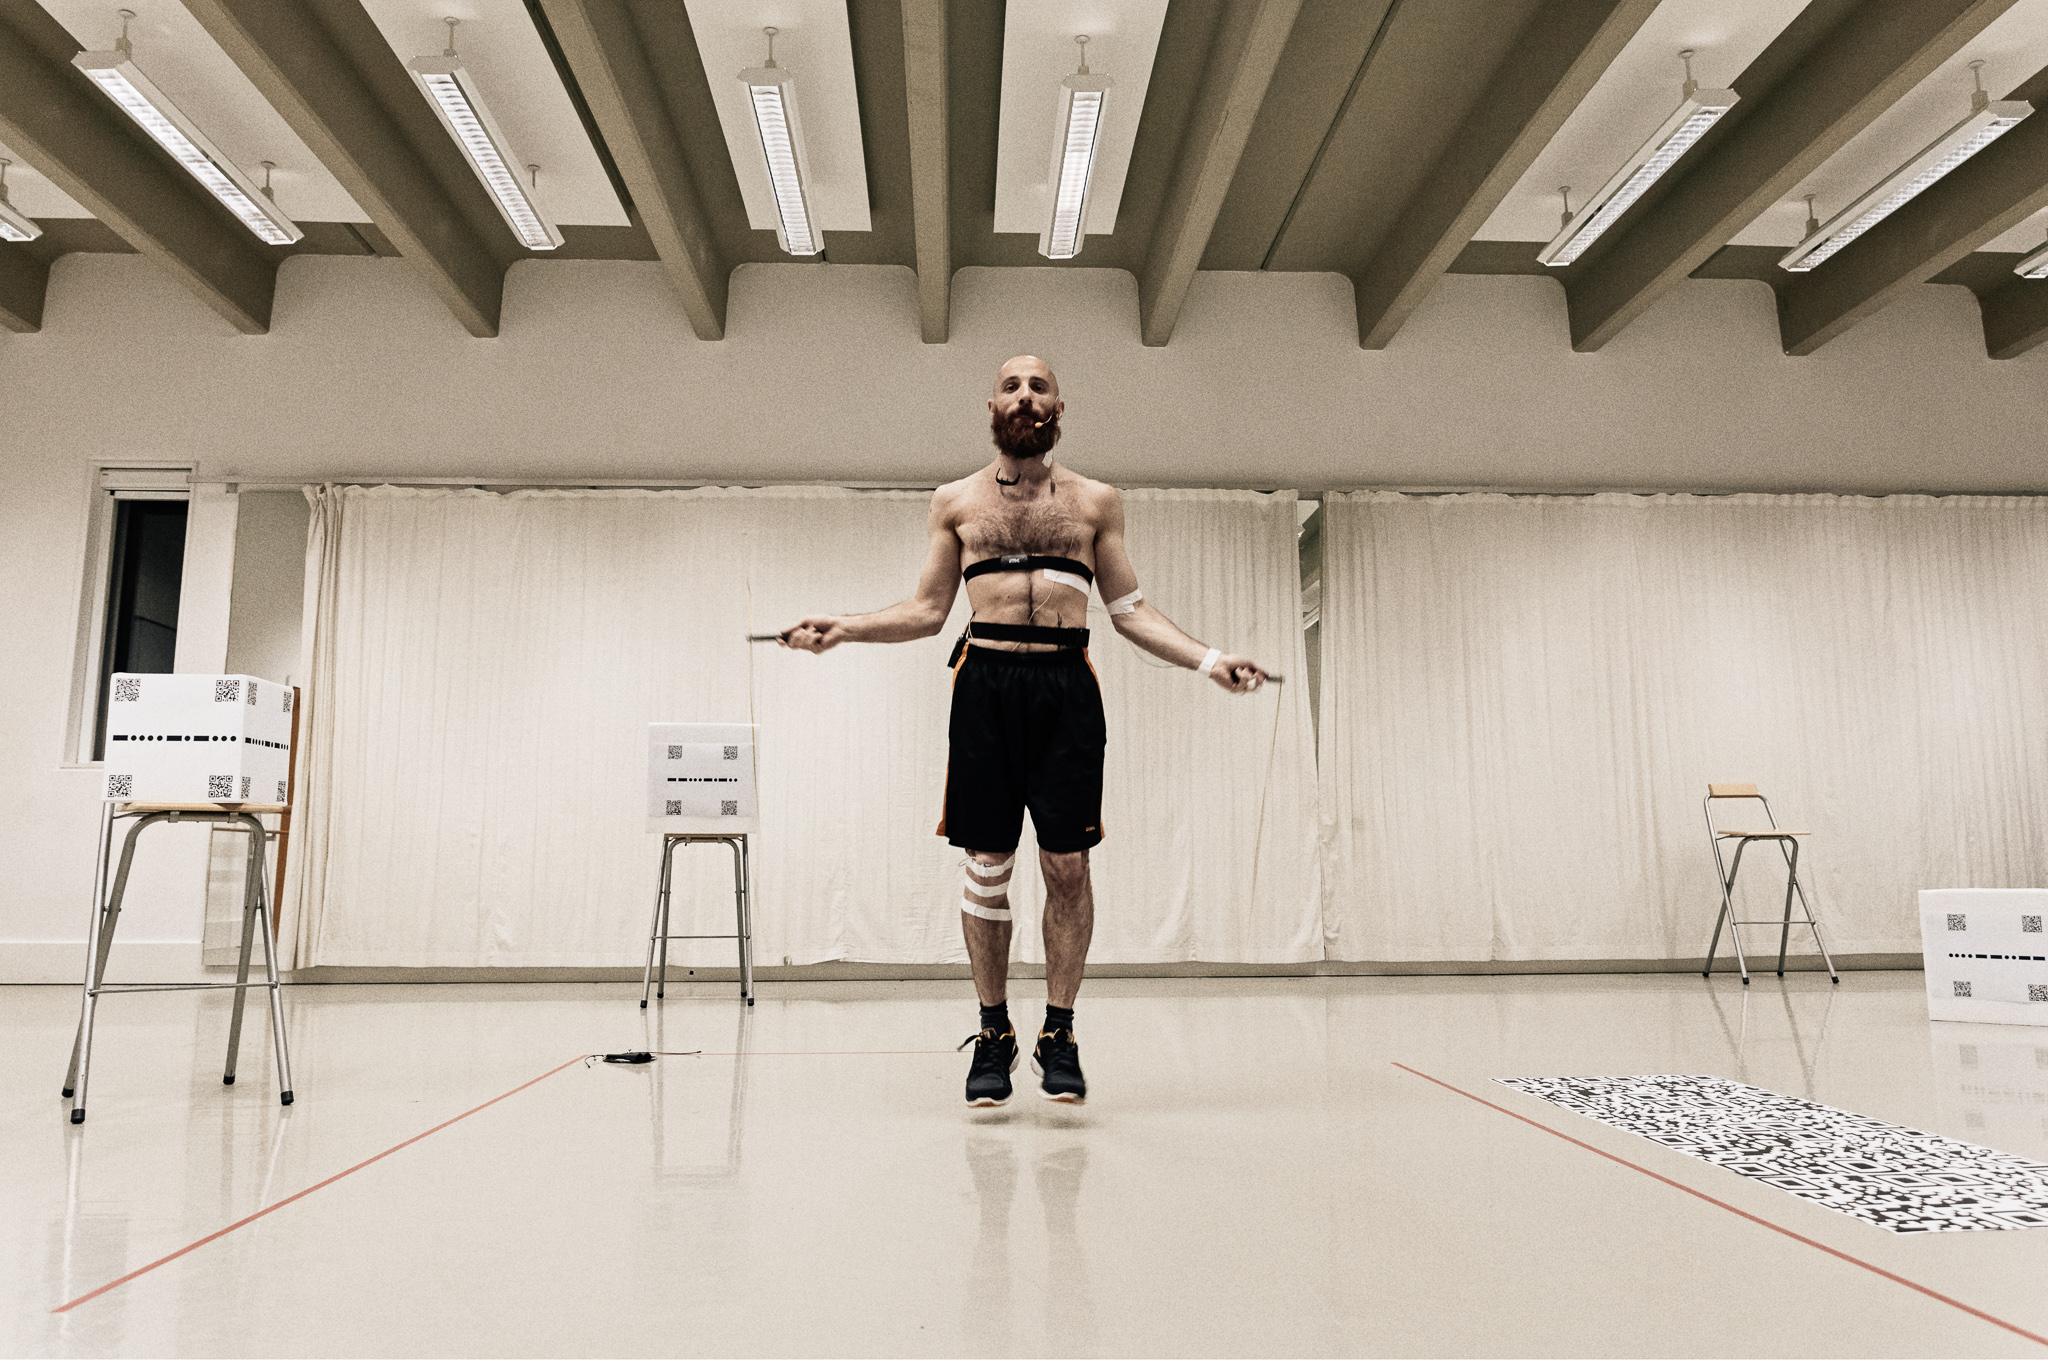 image of Jorge Crecis dance photography, fotografía de ensayo, fotografo de danza, dance photographer, rehearsal photography